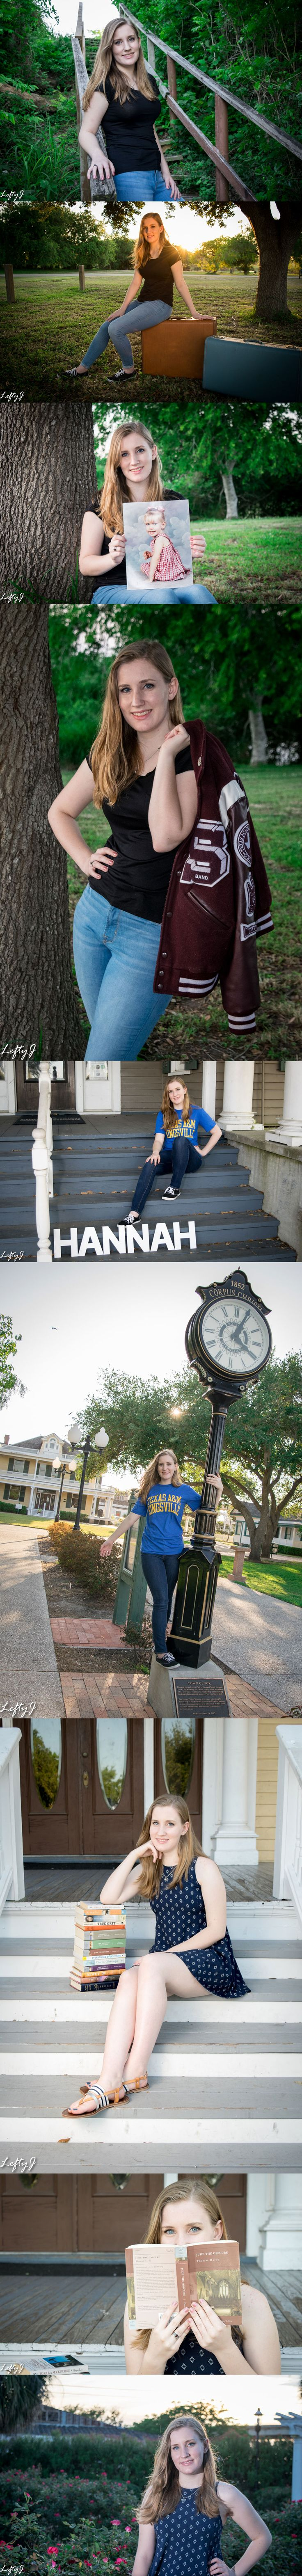 Senior photography of @hannanahsplit by Lefty J Photography, Corpus Christi, TX. #seniorphotos #seniorphotogrpahy #corpuschristi #corpuschristiphotography #corpuschristiphotographer #sinton #sintontx #tamuk #sintonhighschool #sintonpirates